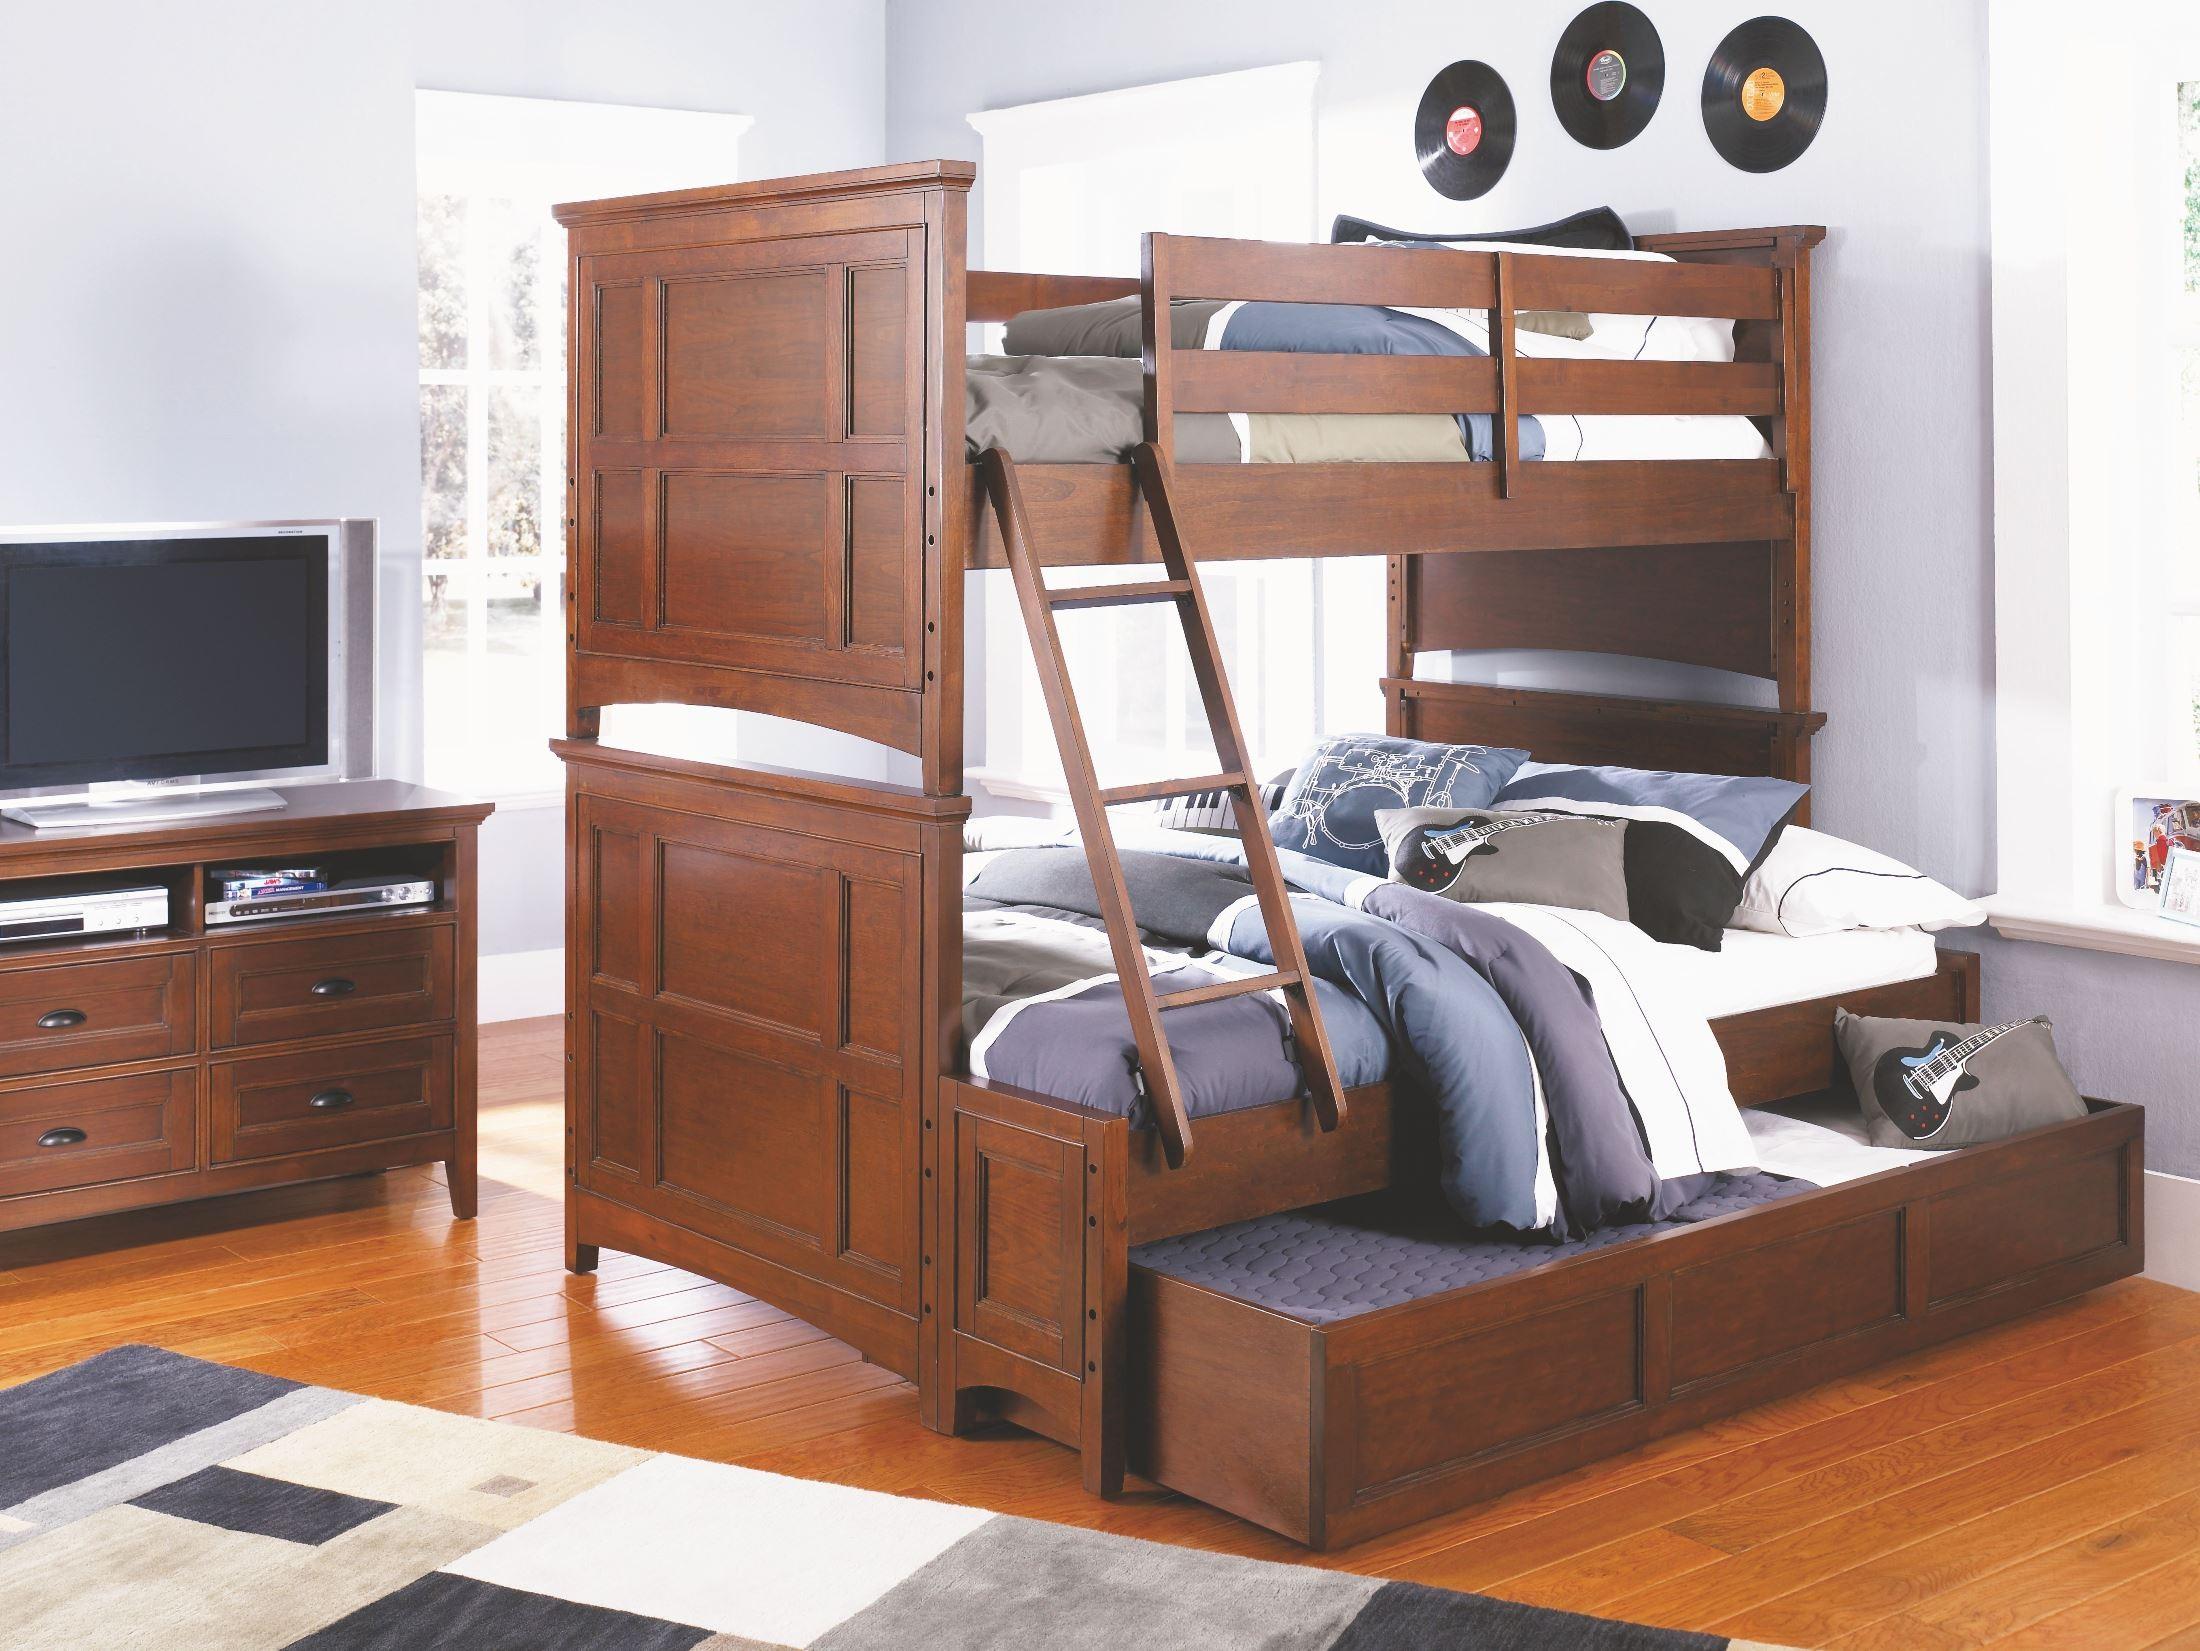 Riley Bunk Bed Bedroom Set From Magnussen Home